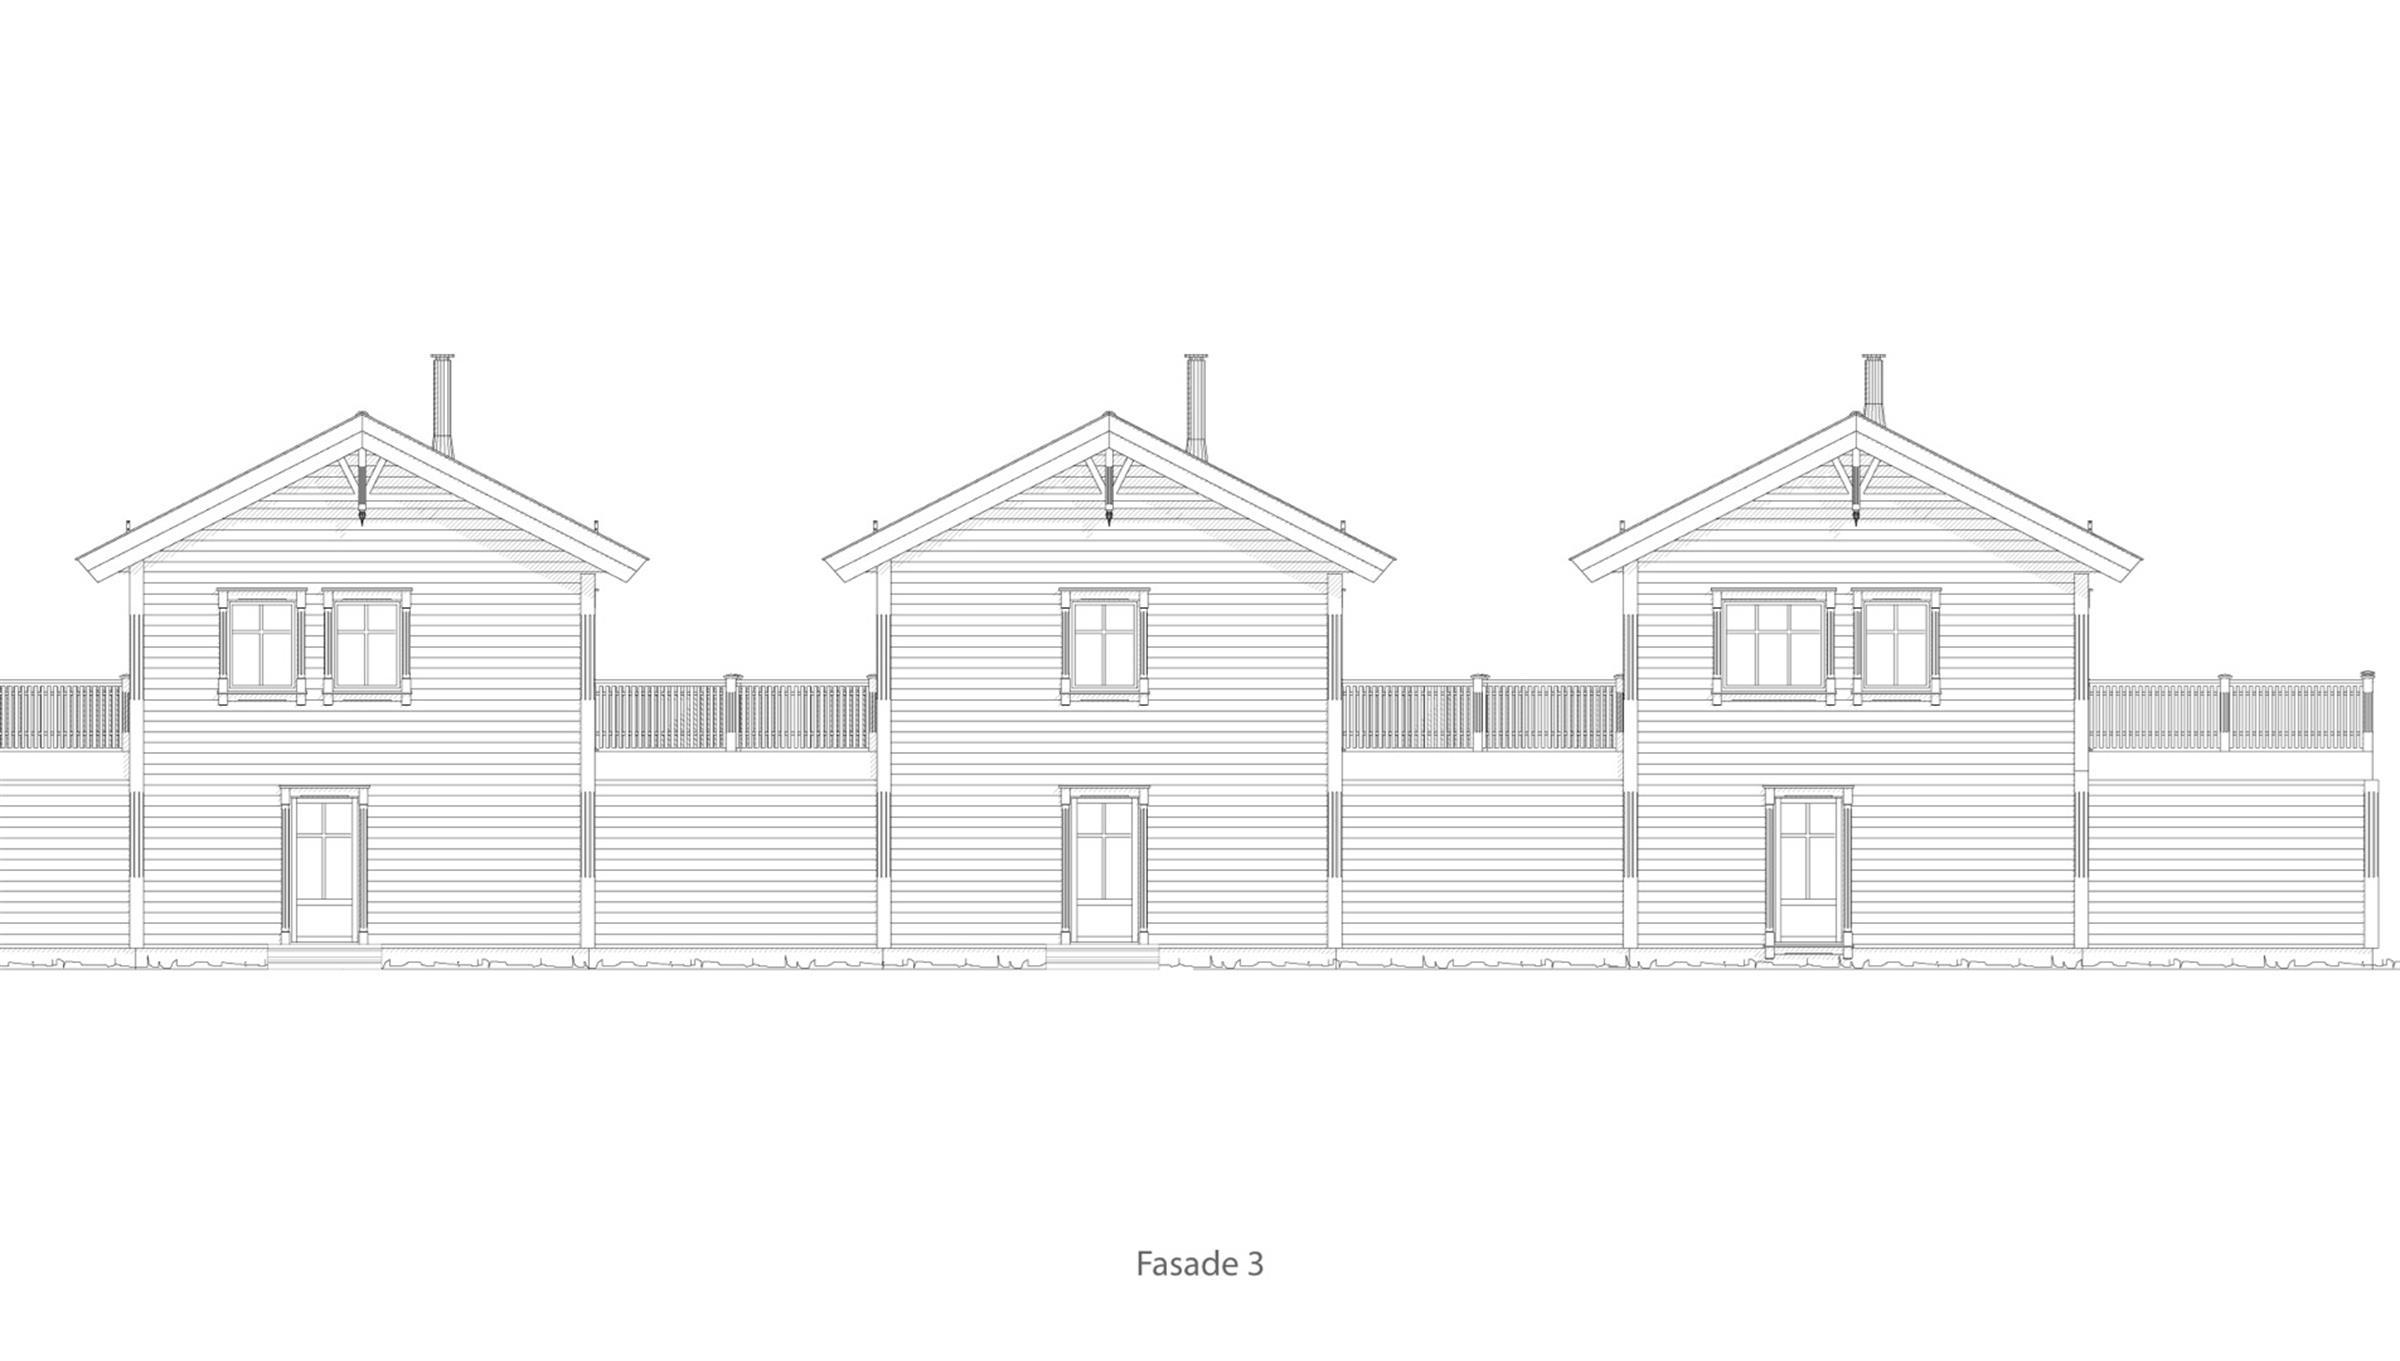 Røros fasade 3